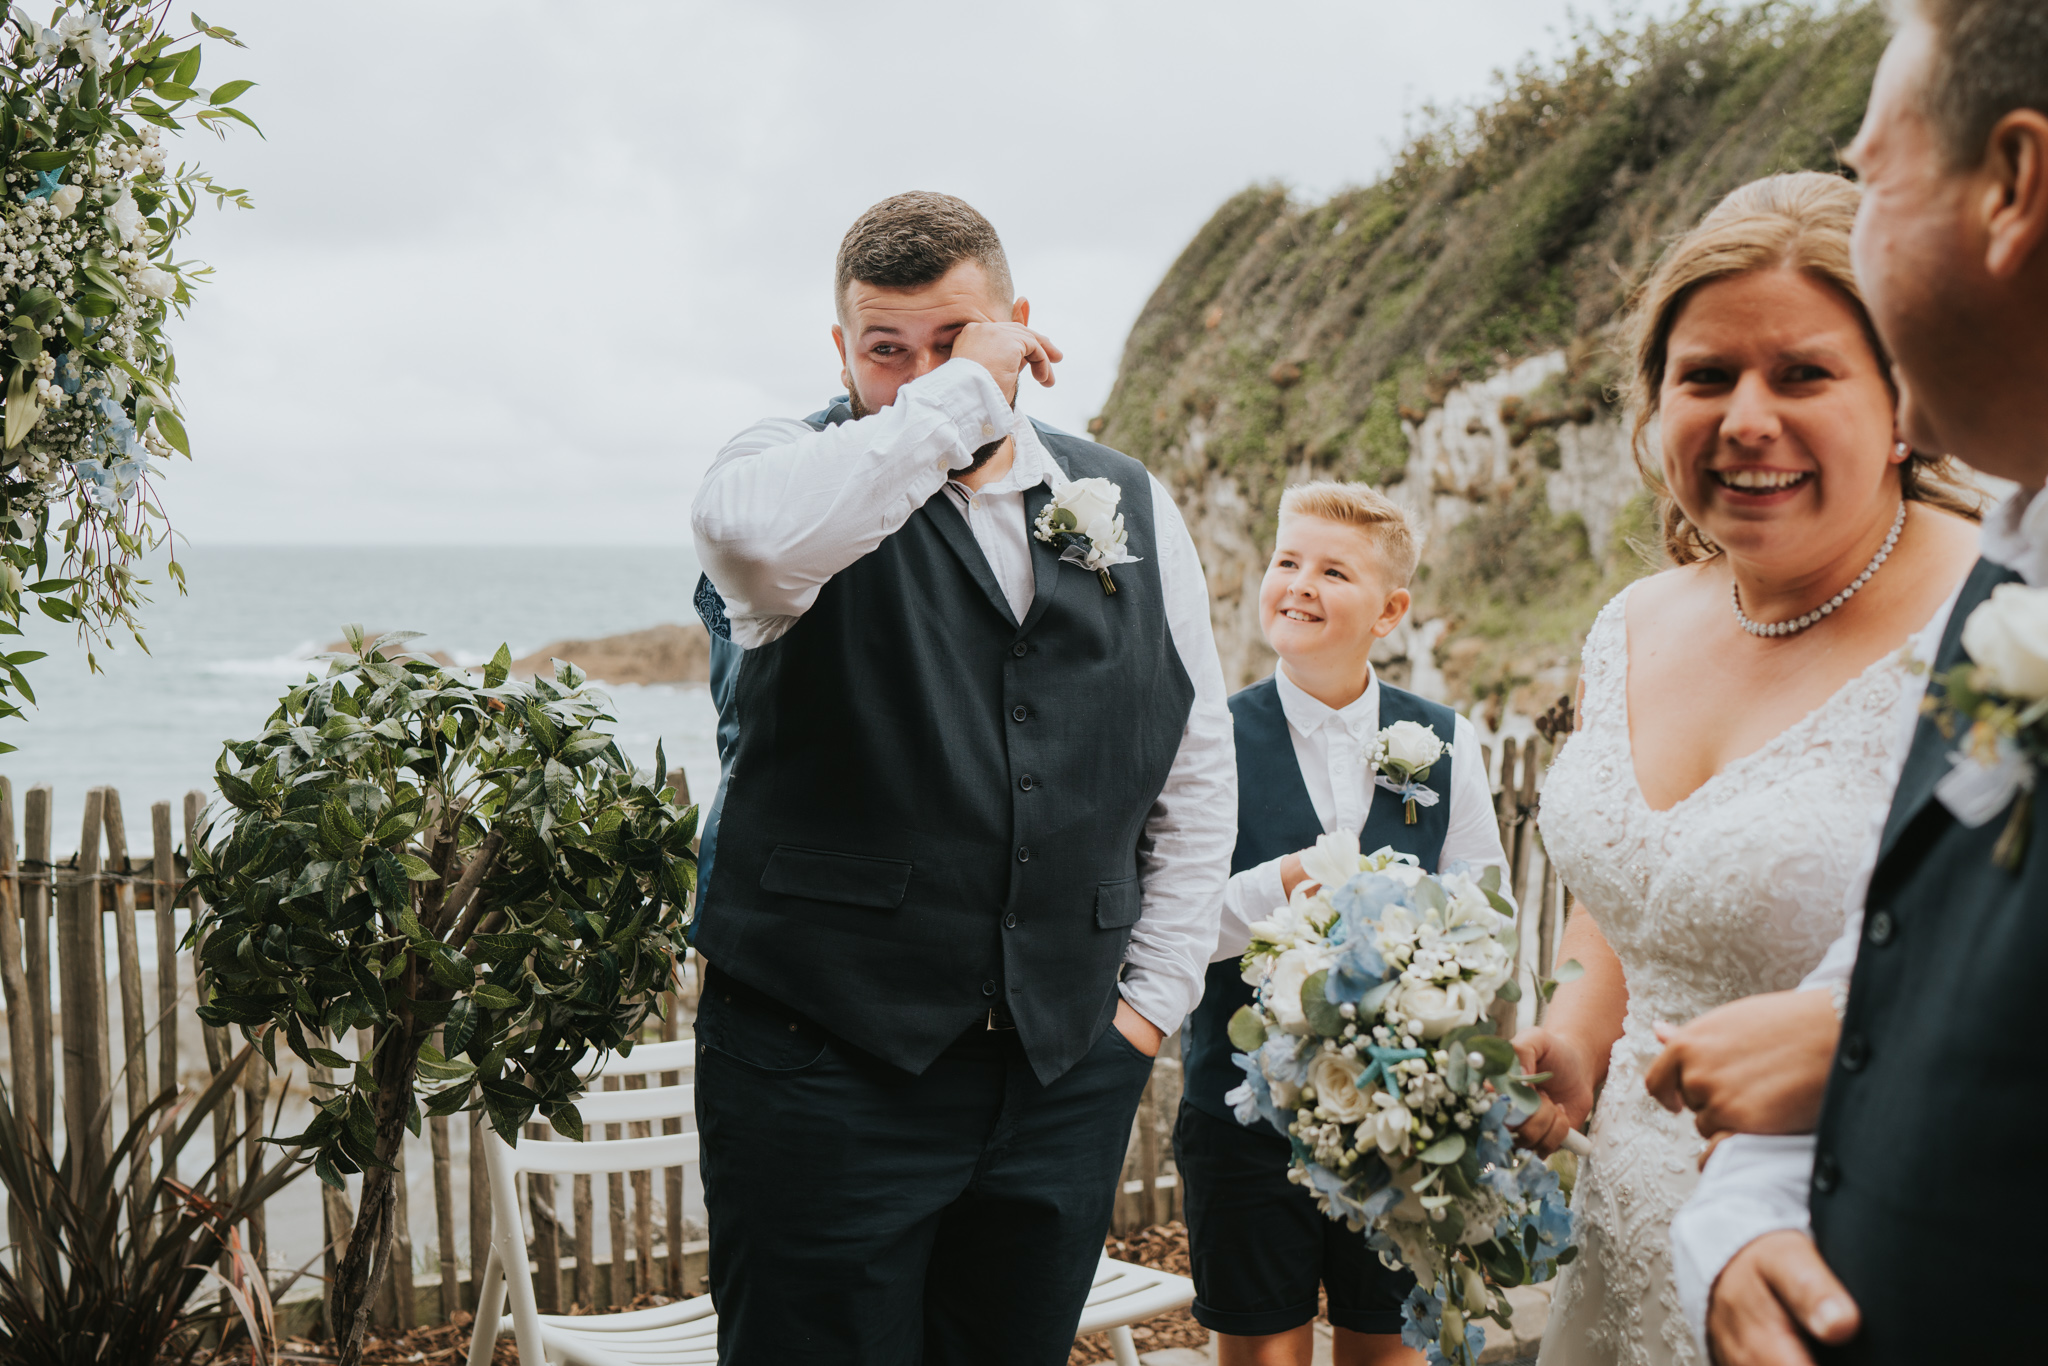 john-amy-relaxed-beach-wedding-tunnels-beaches-ilfracombe-north-devon-grace-elizabeth-colchester-essex-alternative-relaxed-wedding-photography-devon-suffolk-norfolk-essex (52 of 159).jpg